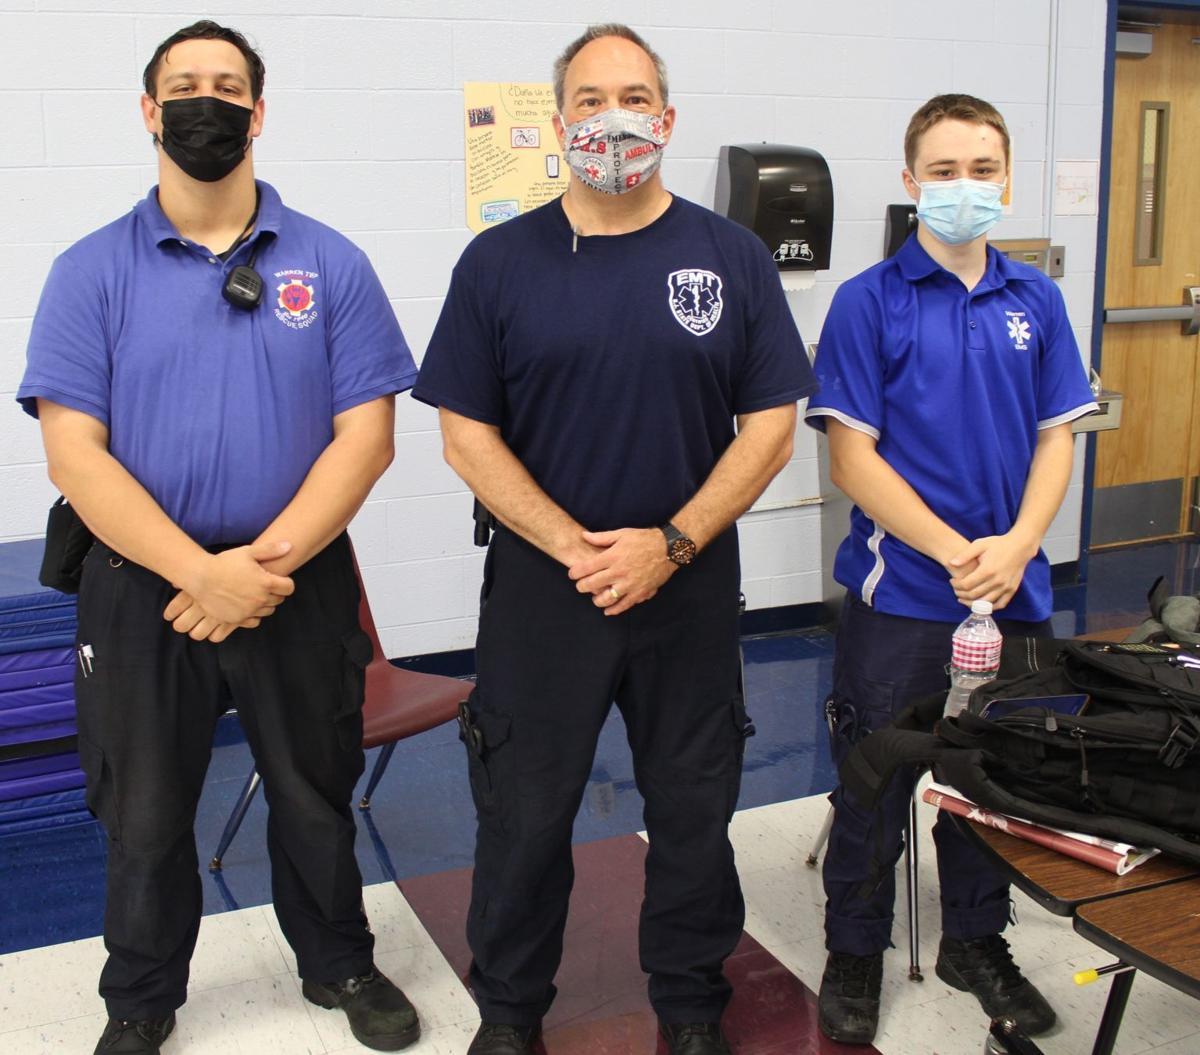 3. Anthony Levine, Ward Scheiderman and Ryan Presgraves from the Warren Township Volunteer Rescue Squad.JPG